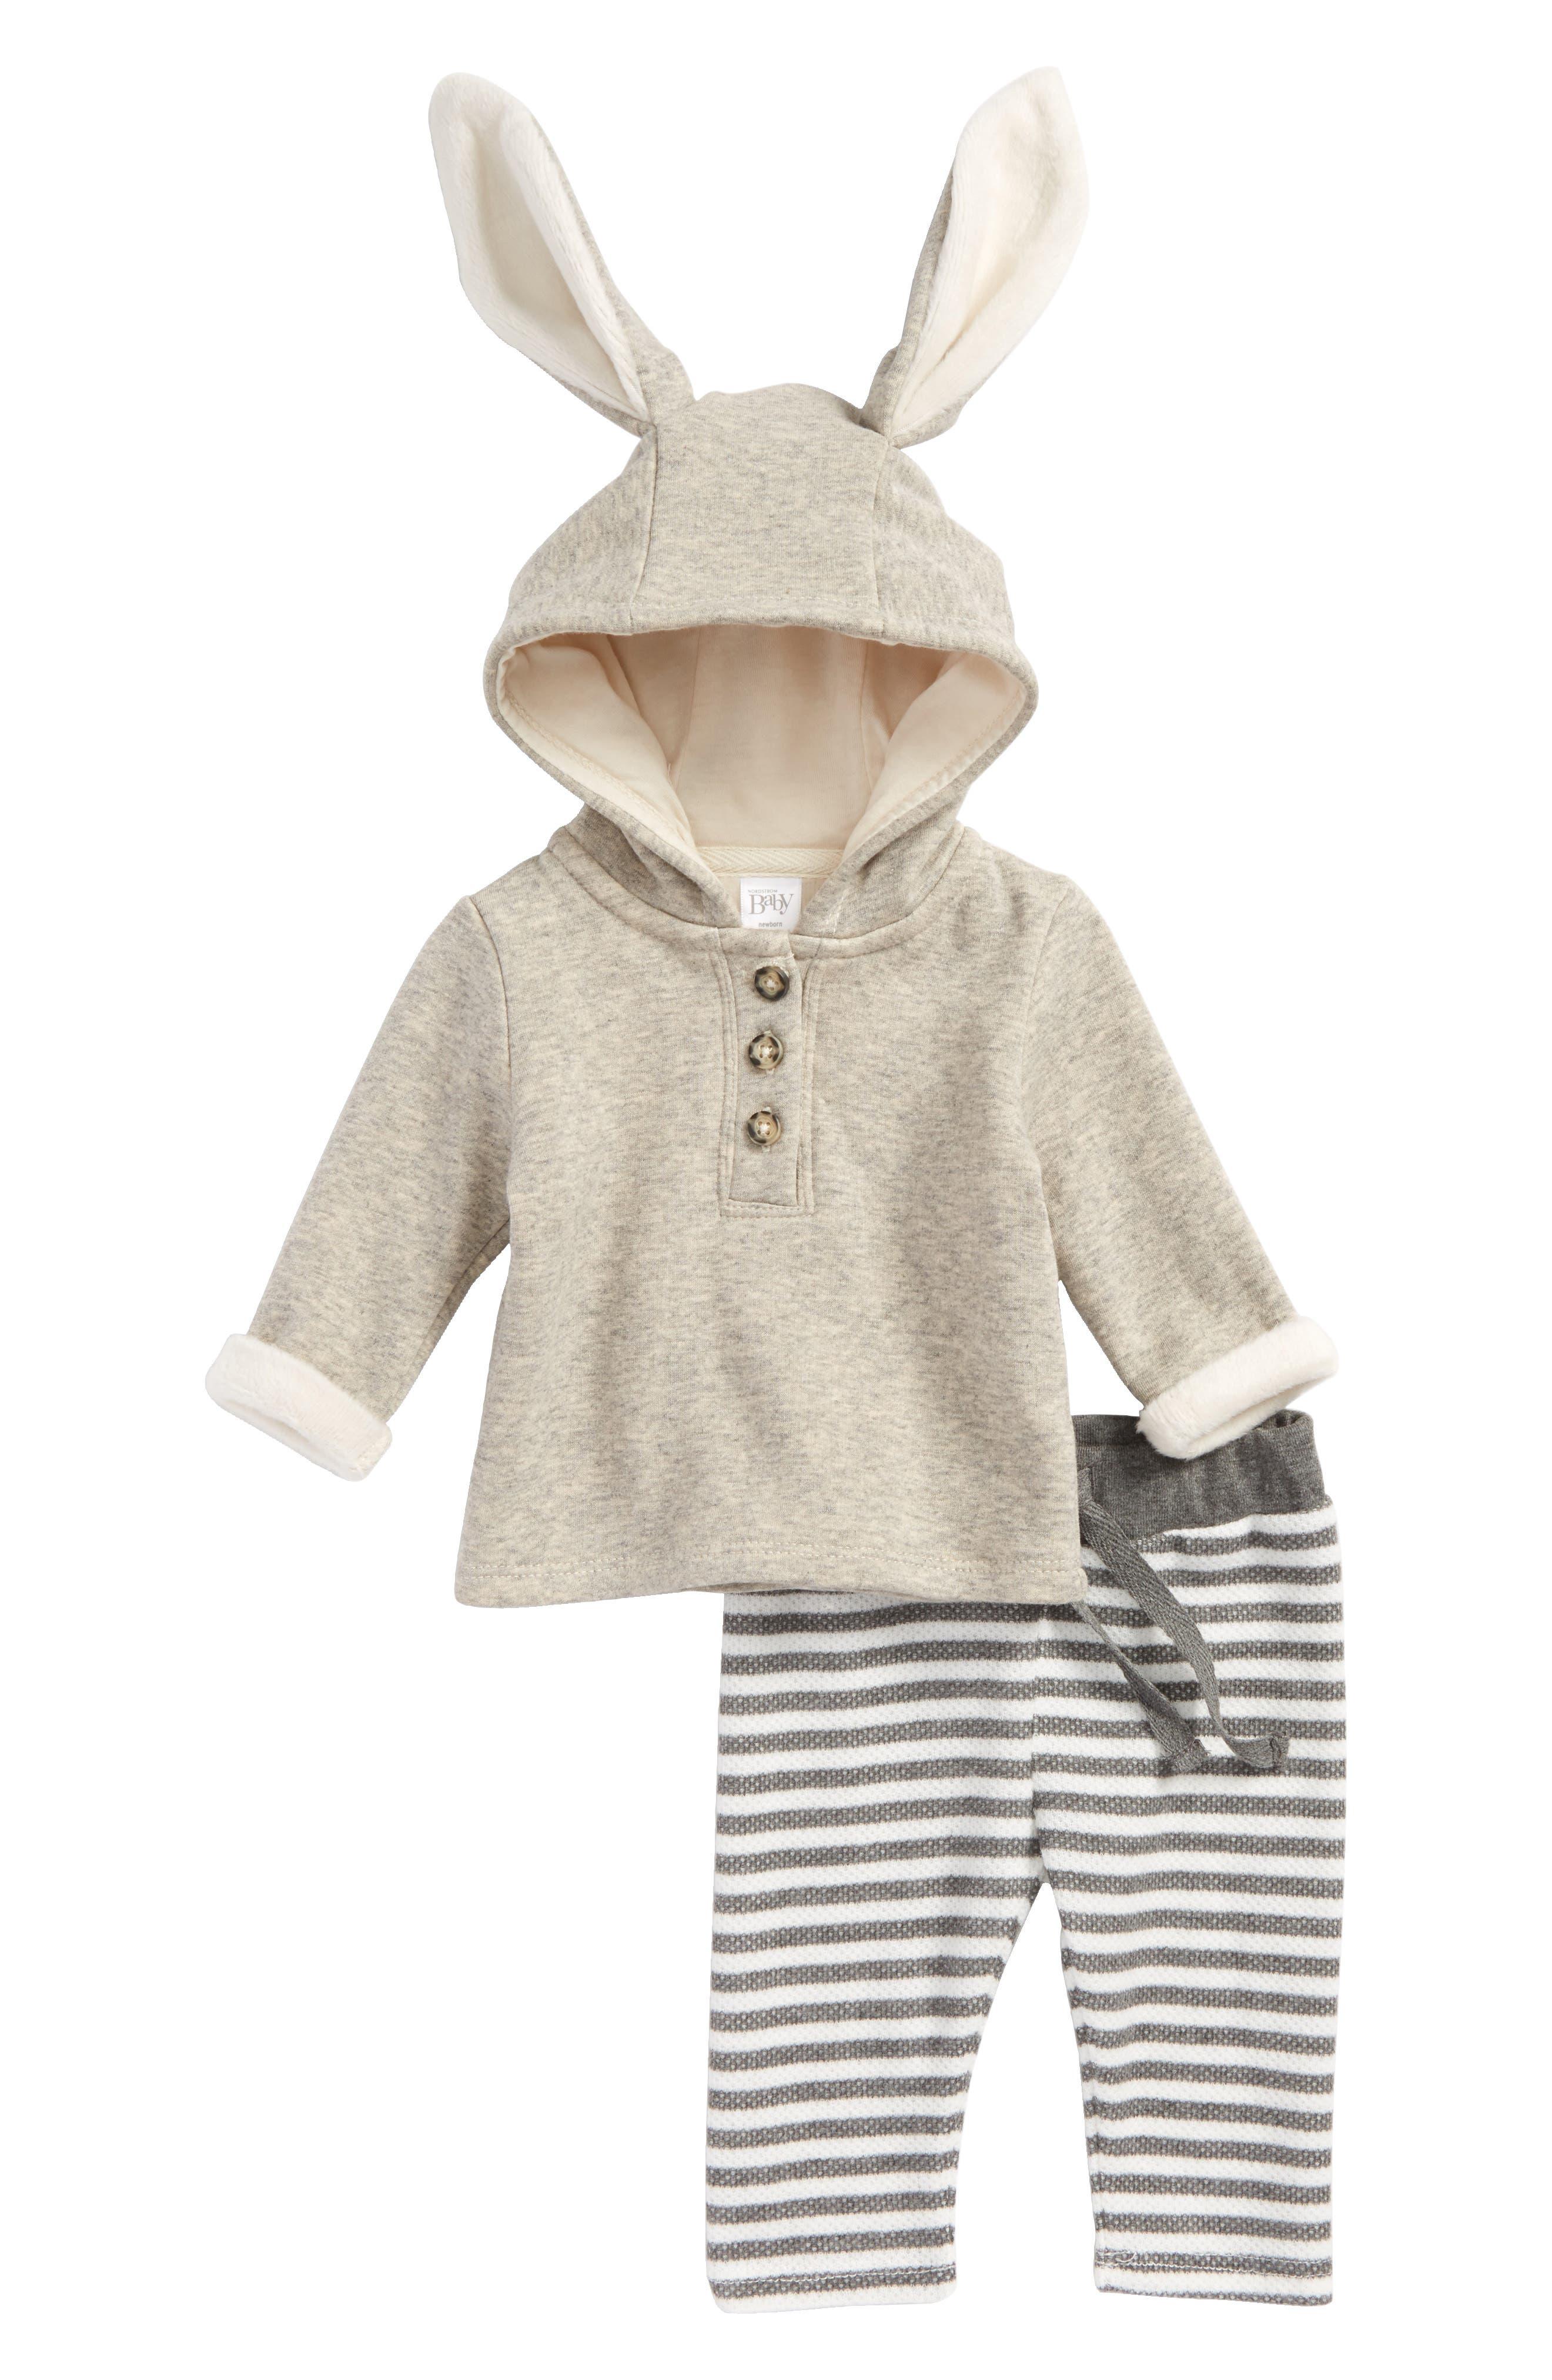 Main Image - Nordstrom Baby Cozy Bunny Sweatshirt & Leggings Set (Baby)